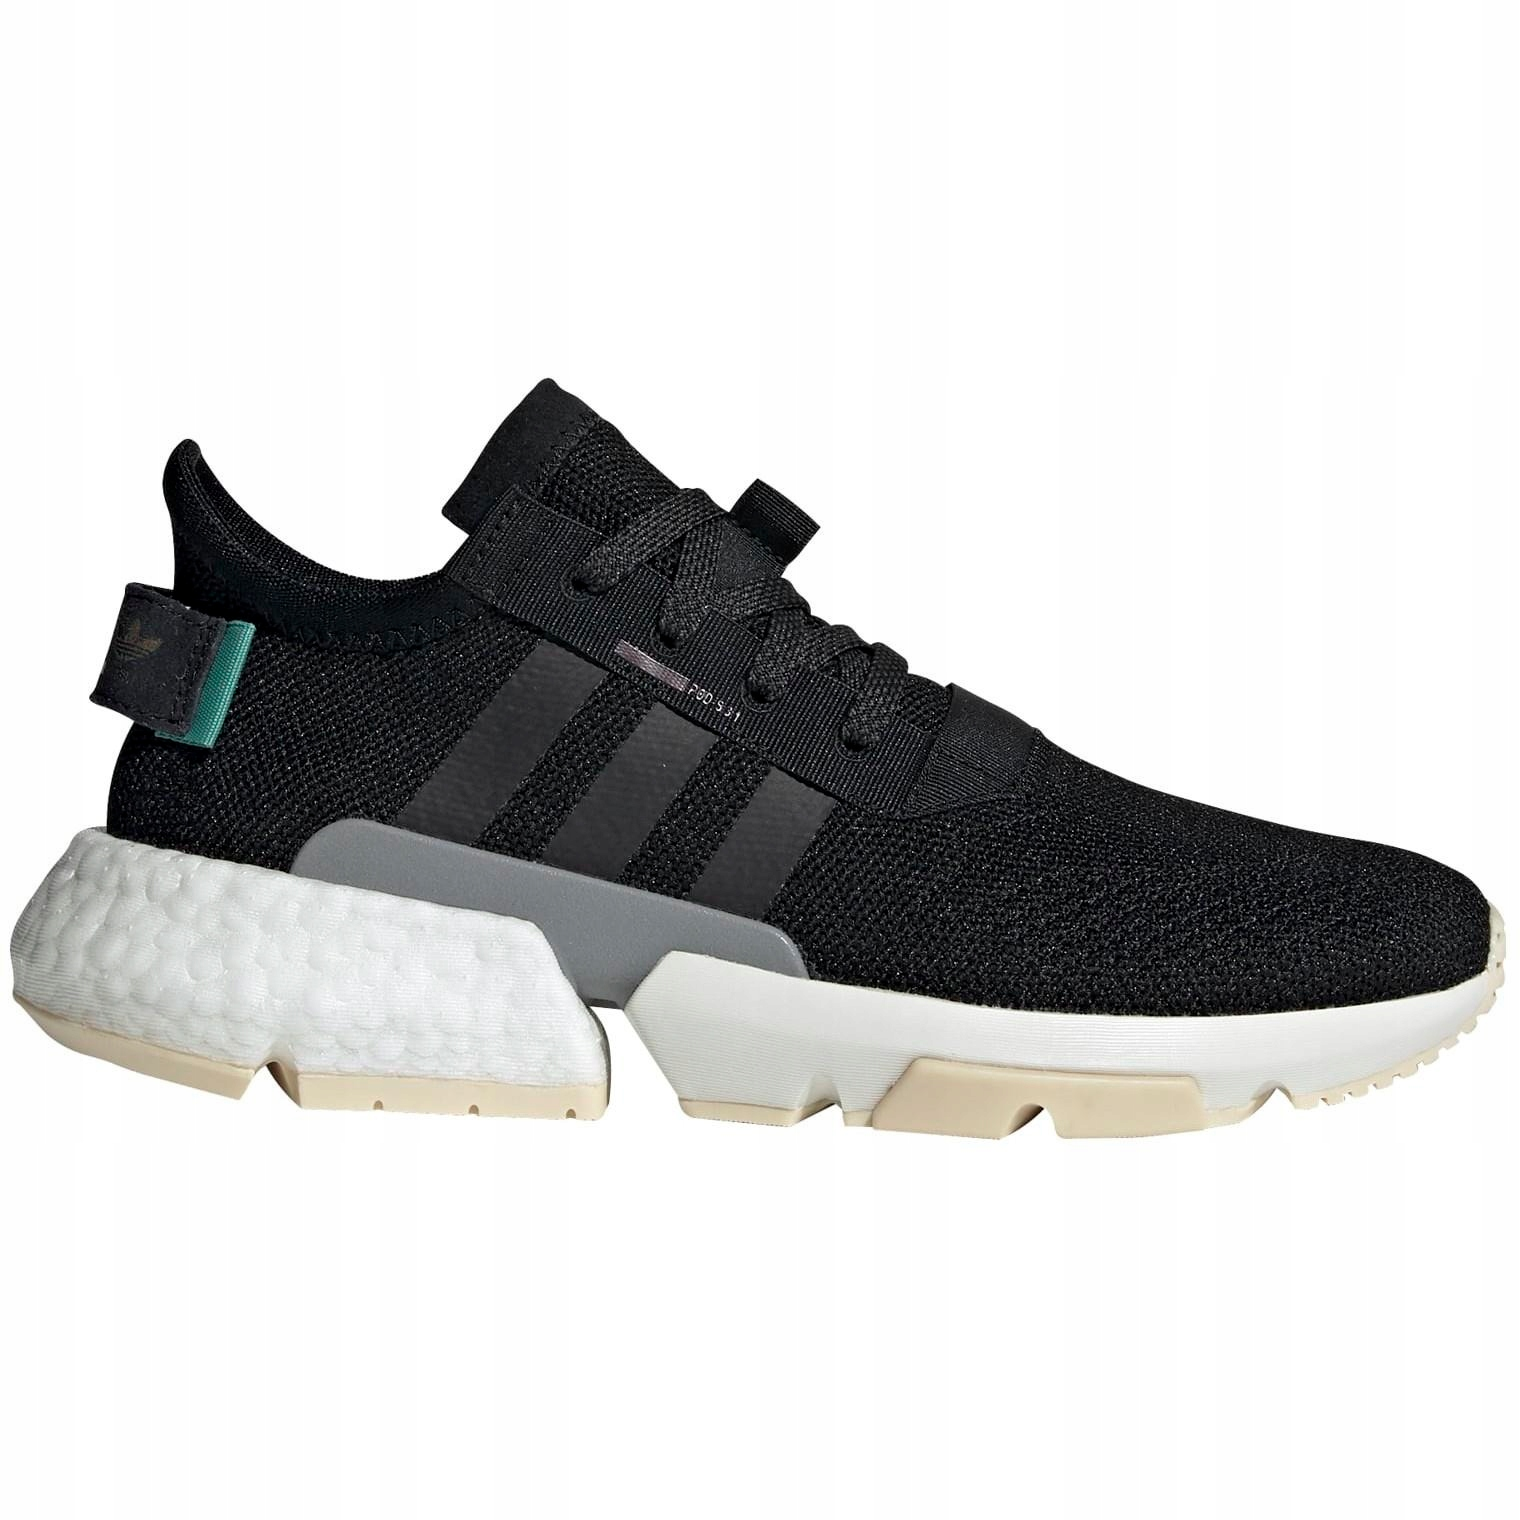 Buty adidas Pod CG6183 CG6183-a3 r 38 2/3